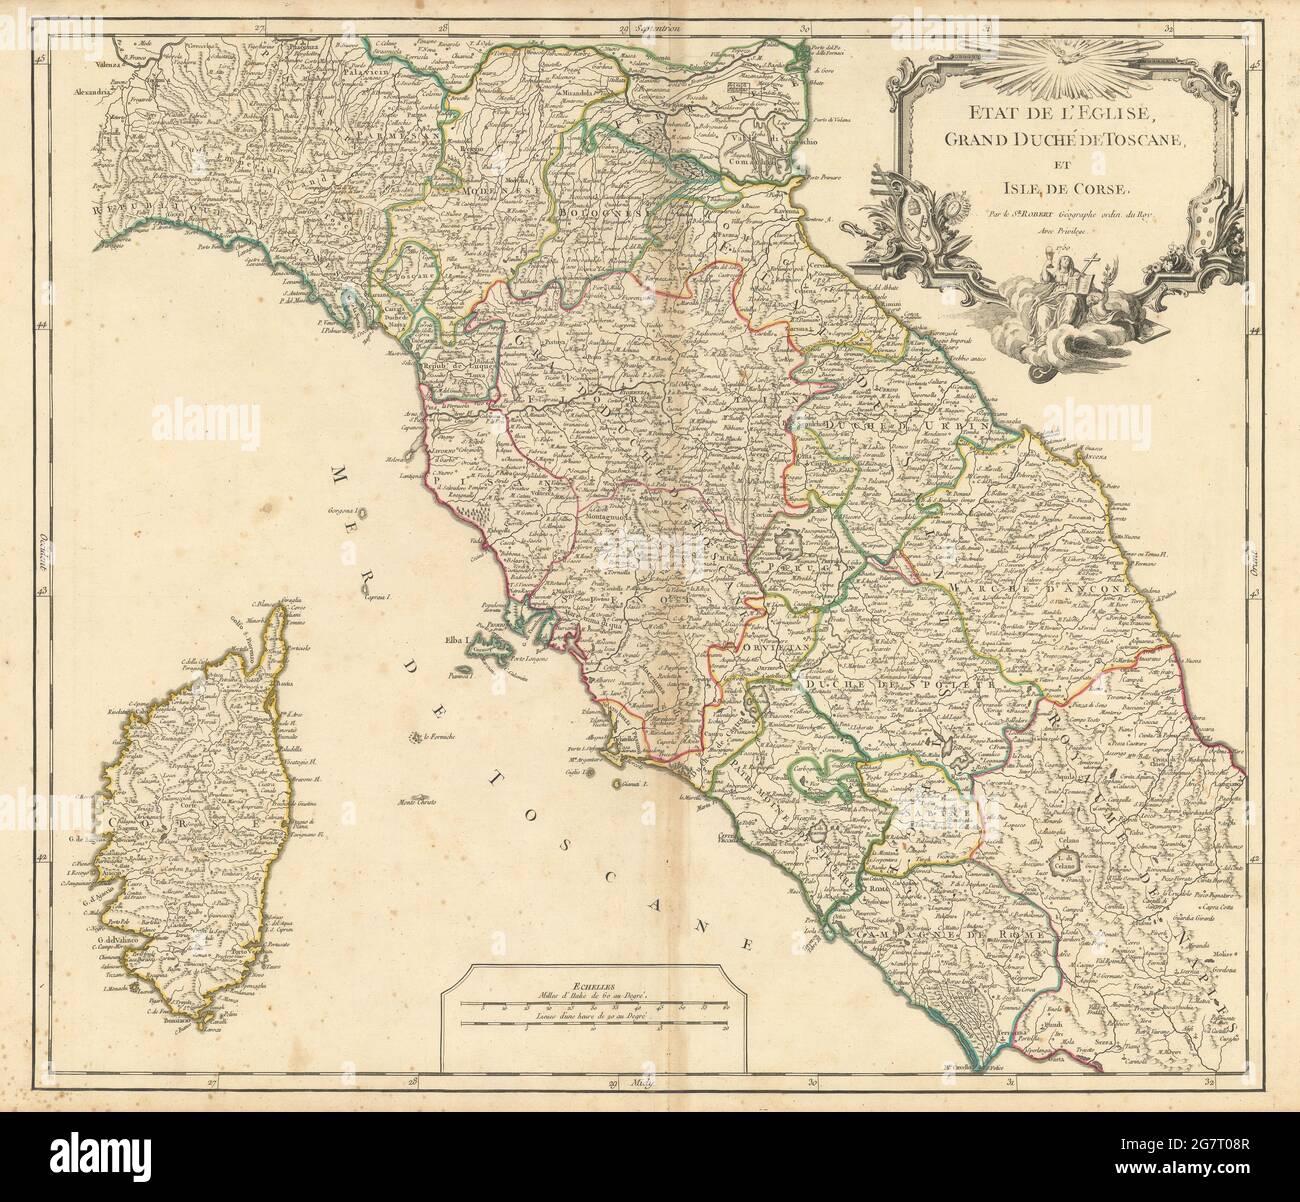 'Etet l'Eglise, Grand Duché Toscane et Isle Corse' Toskana. VAUGONDY 1750-Karte Stockfoto